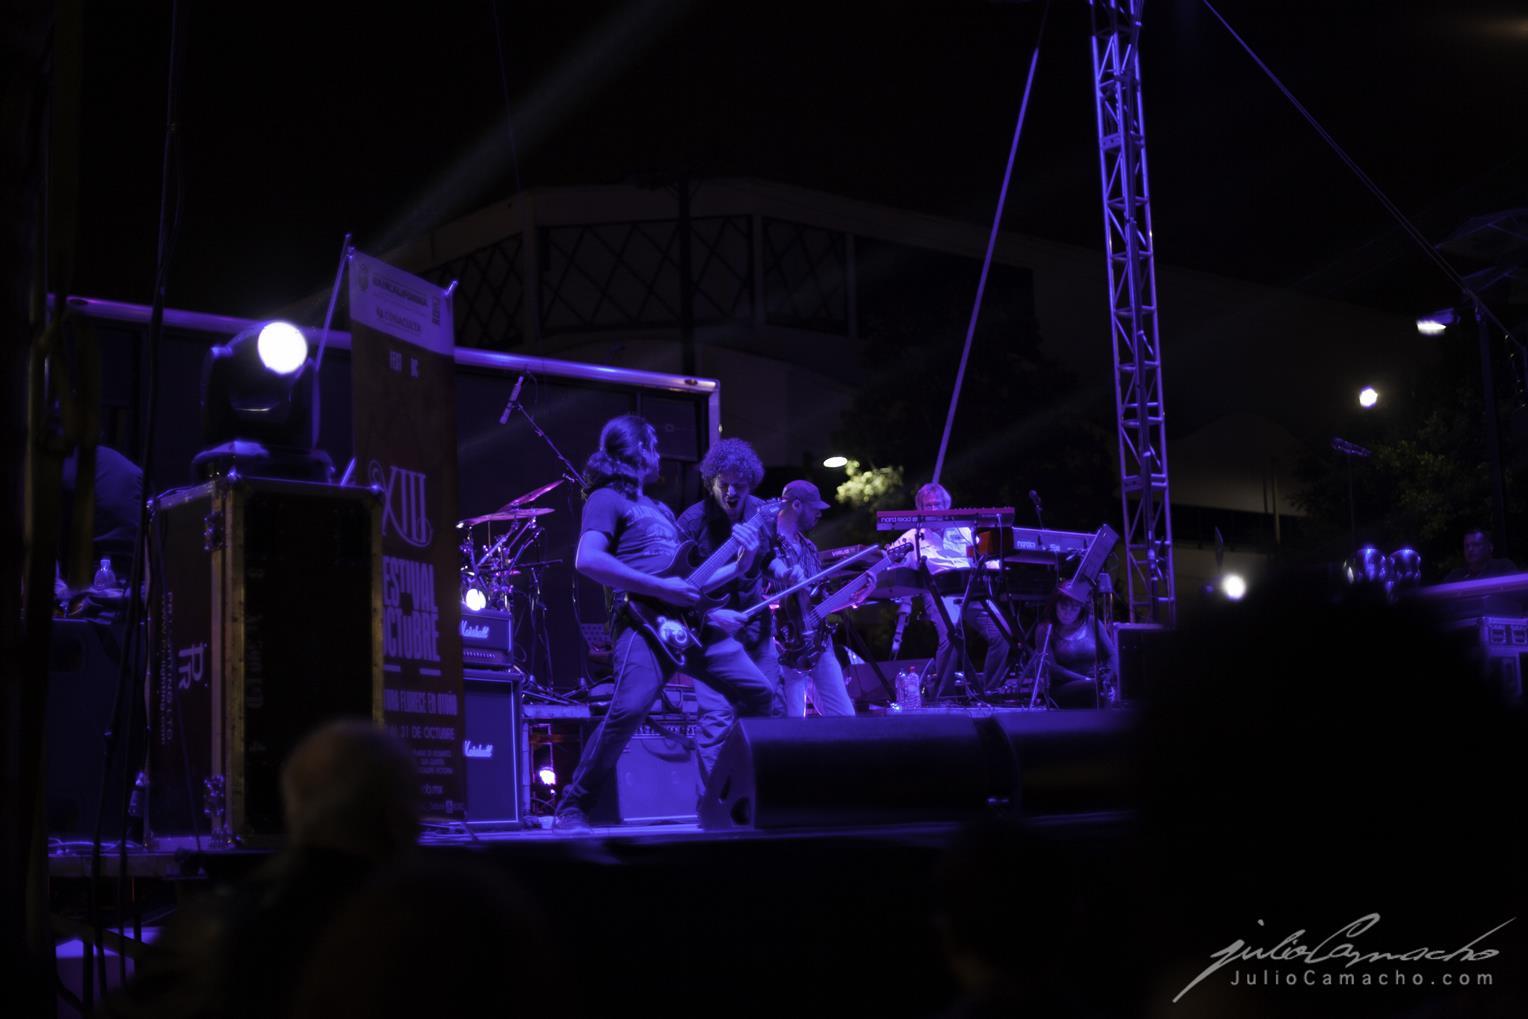 2014-10-30 31 CAST TOUR Ensenada y Tijuana - 1516 - www.Juli (Copy).jpg